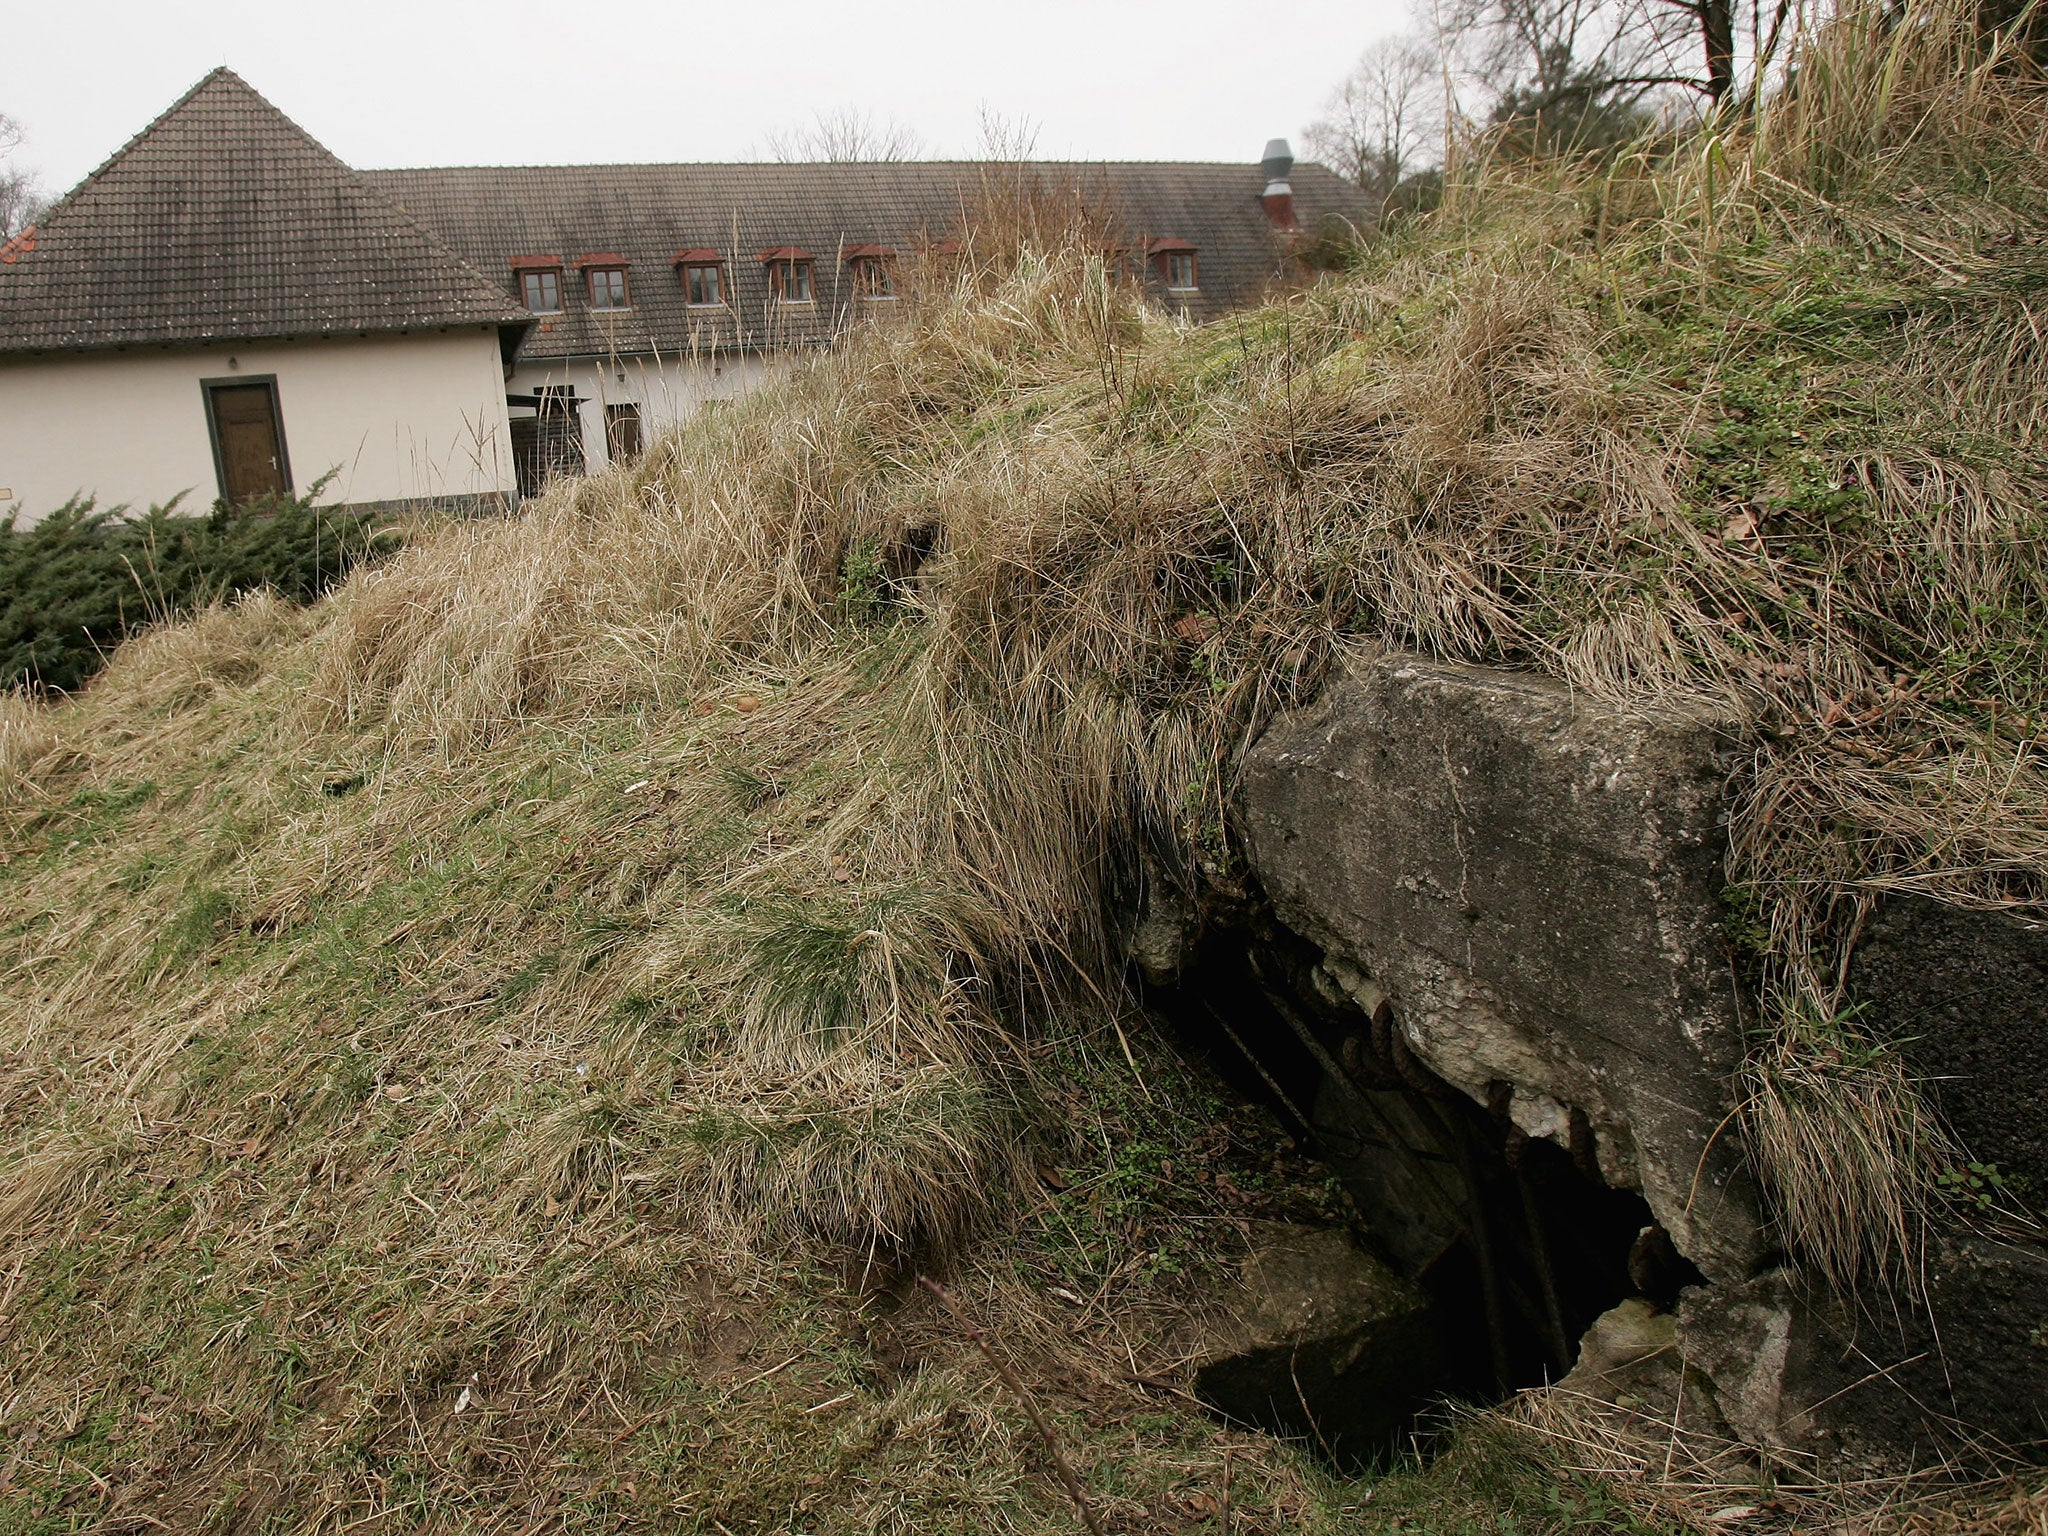 Secret Nazi nuclear bunker discovered in Austria by